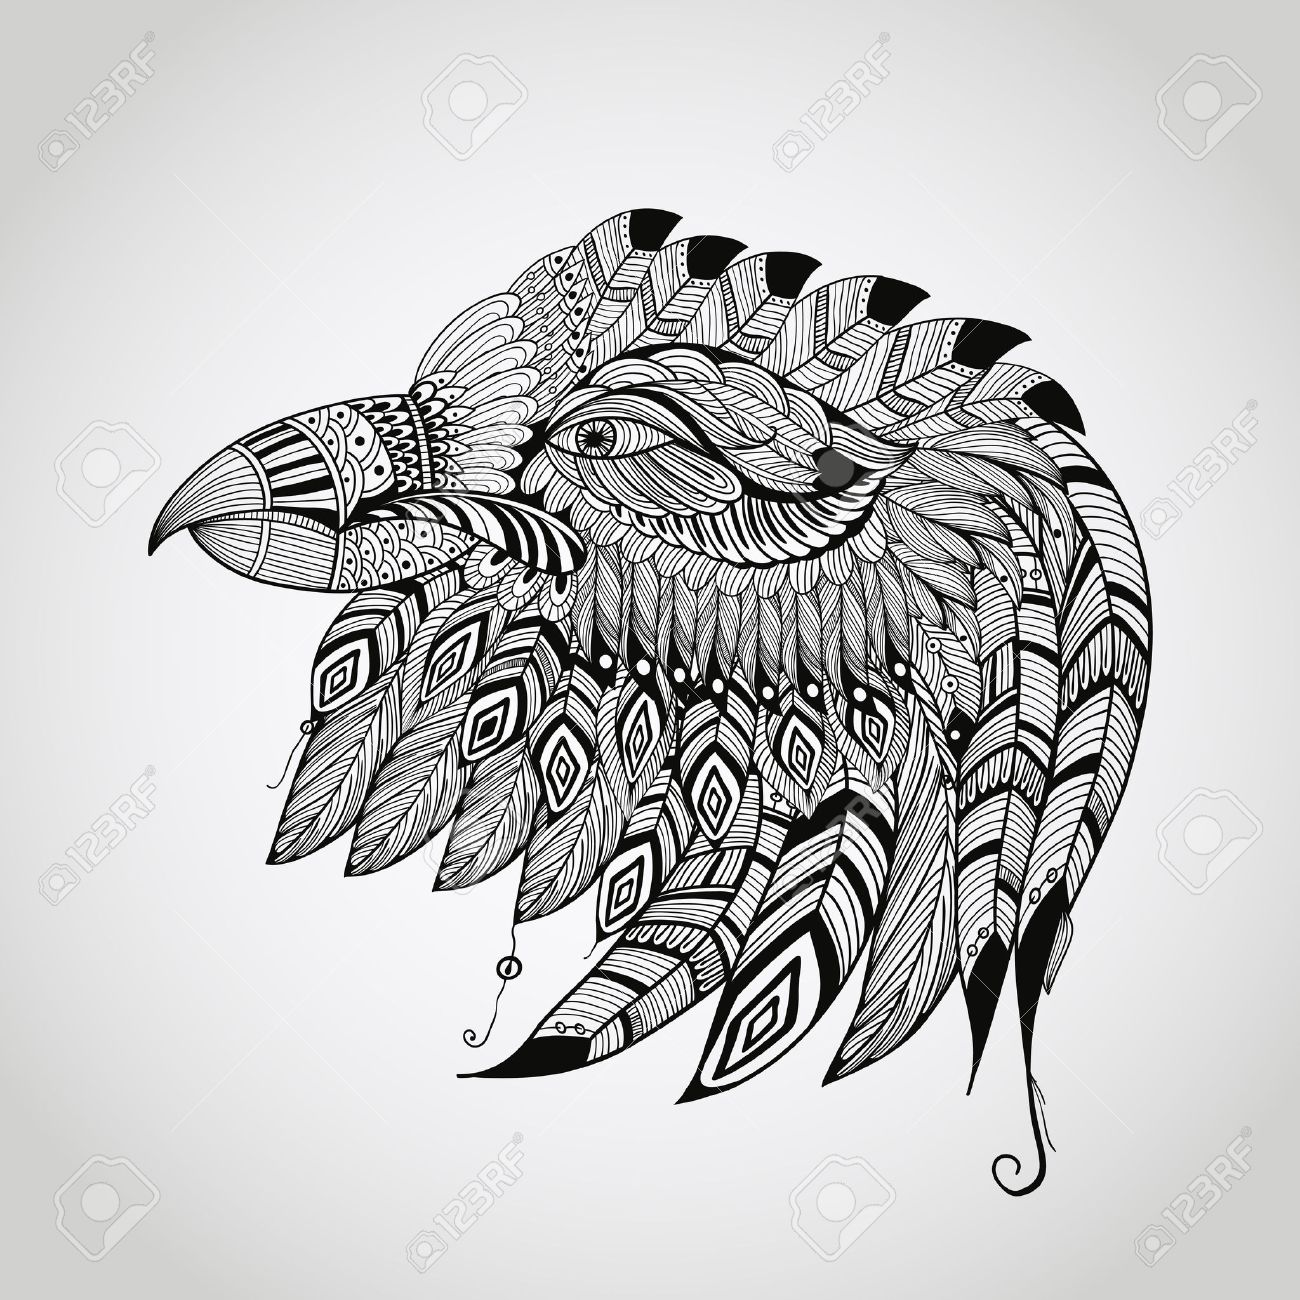 1300x1300 Native American Eagle Feather Tattoo